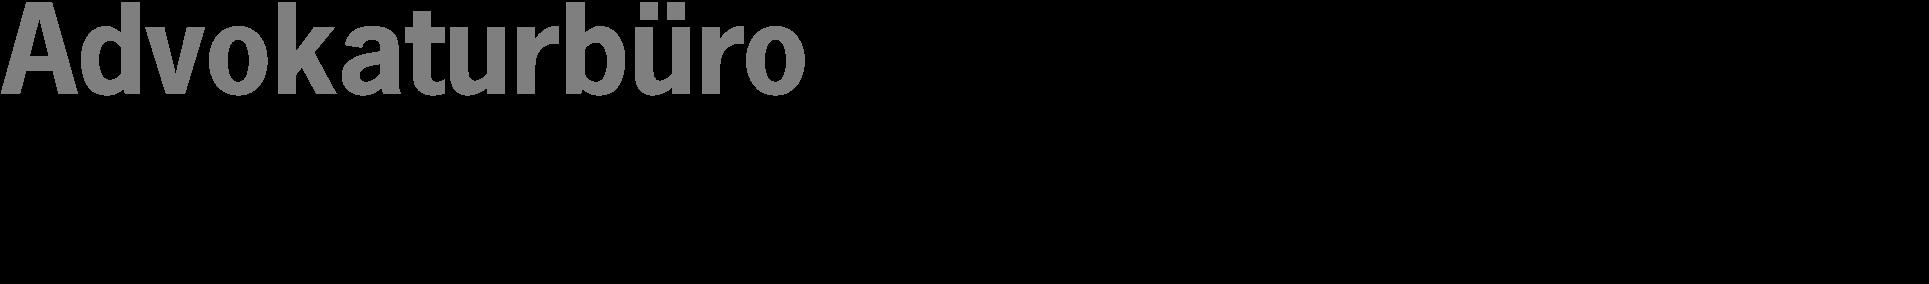 Advokaturbüro Keller Schmutz Eisenhut Stucki Logo